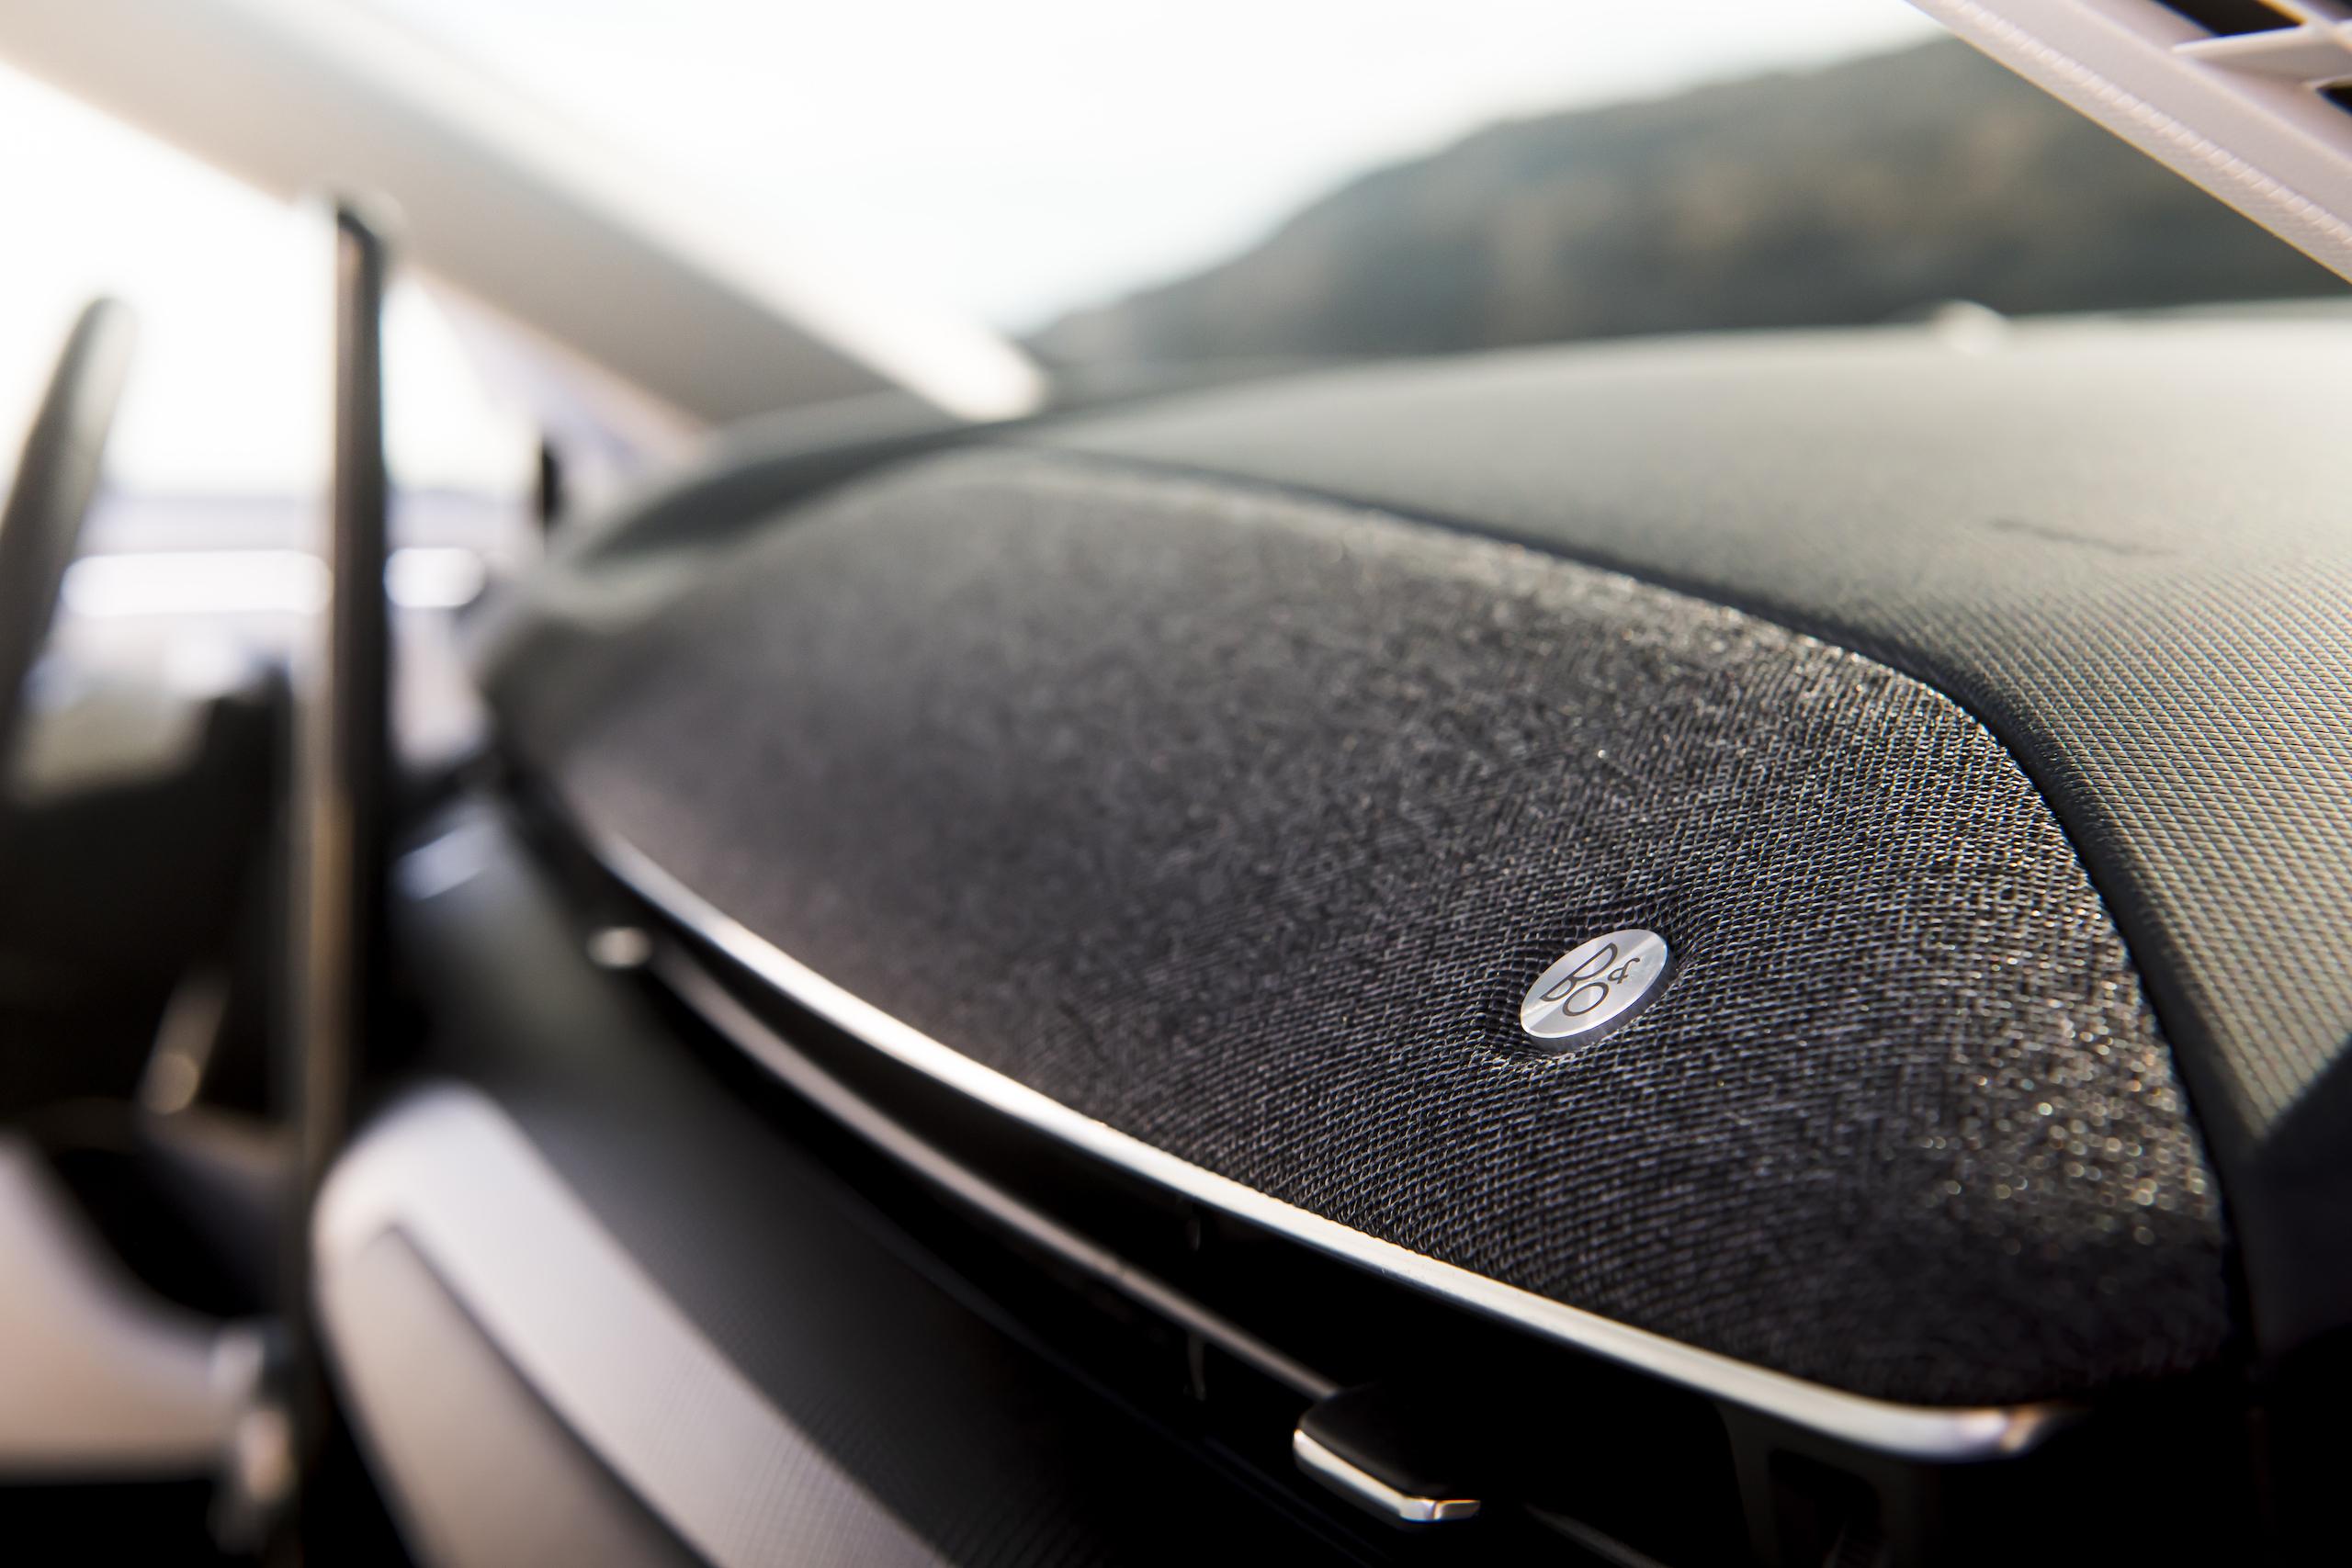 Mustang Mach-E front dash detail bang olufsen